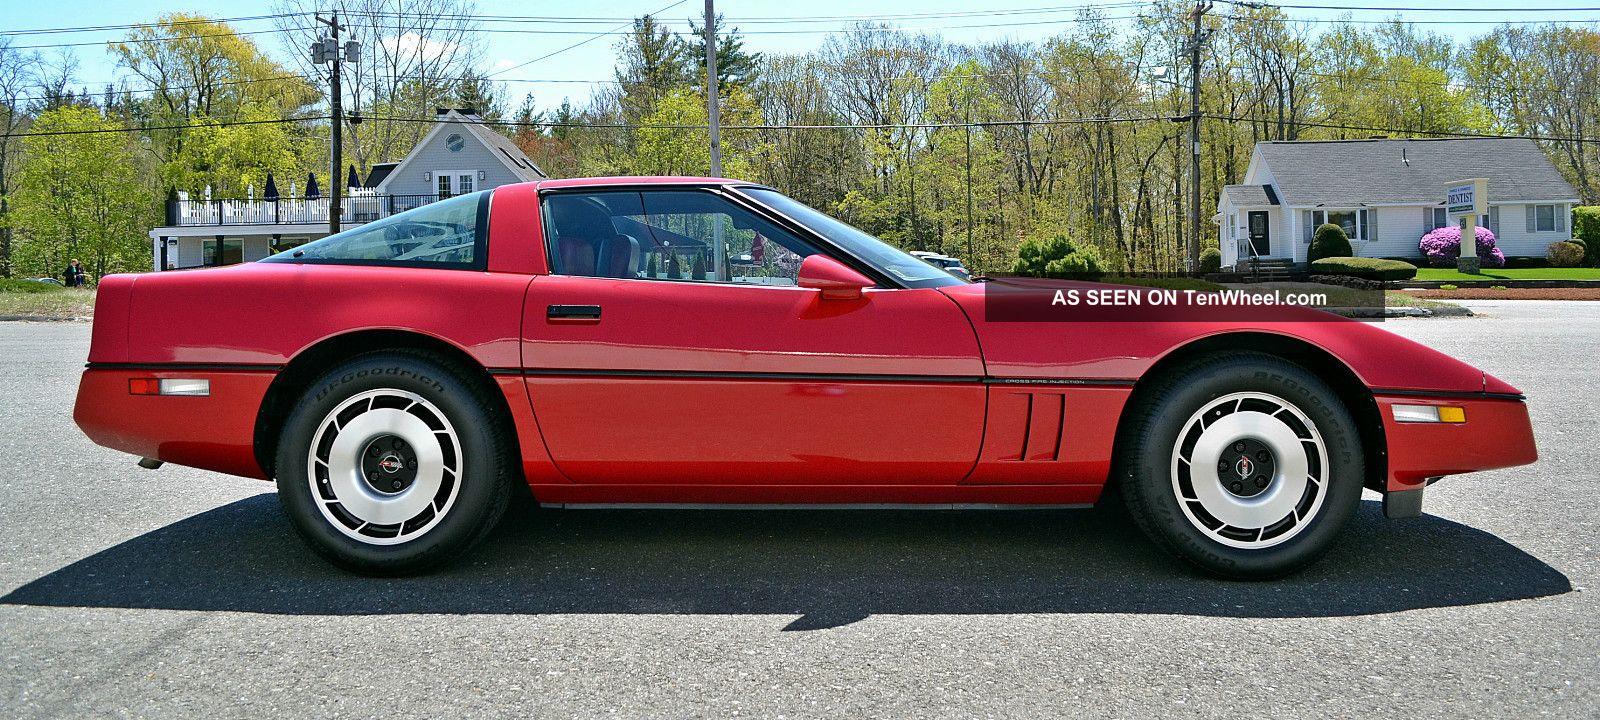 1984 chevrolet corvette. Black Bedroom Furniture Sets. Home Design Ideas